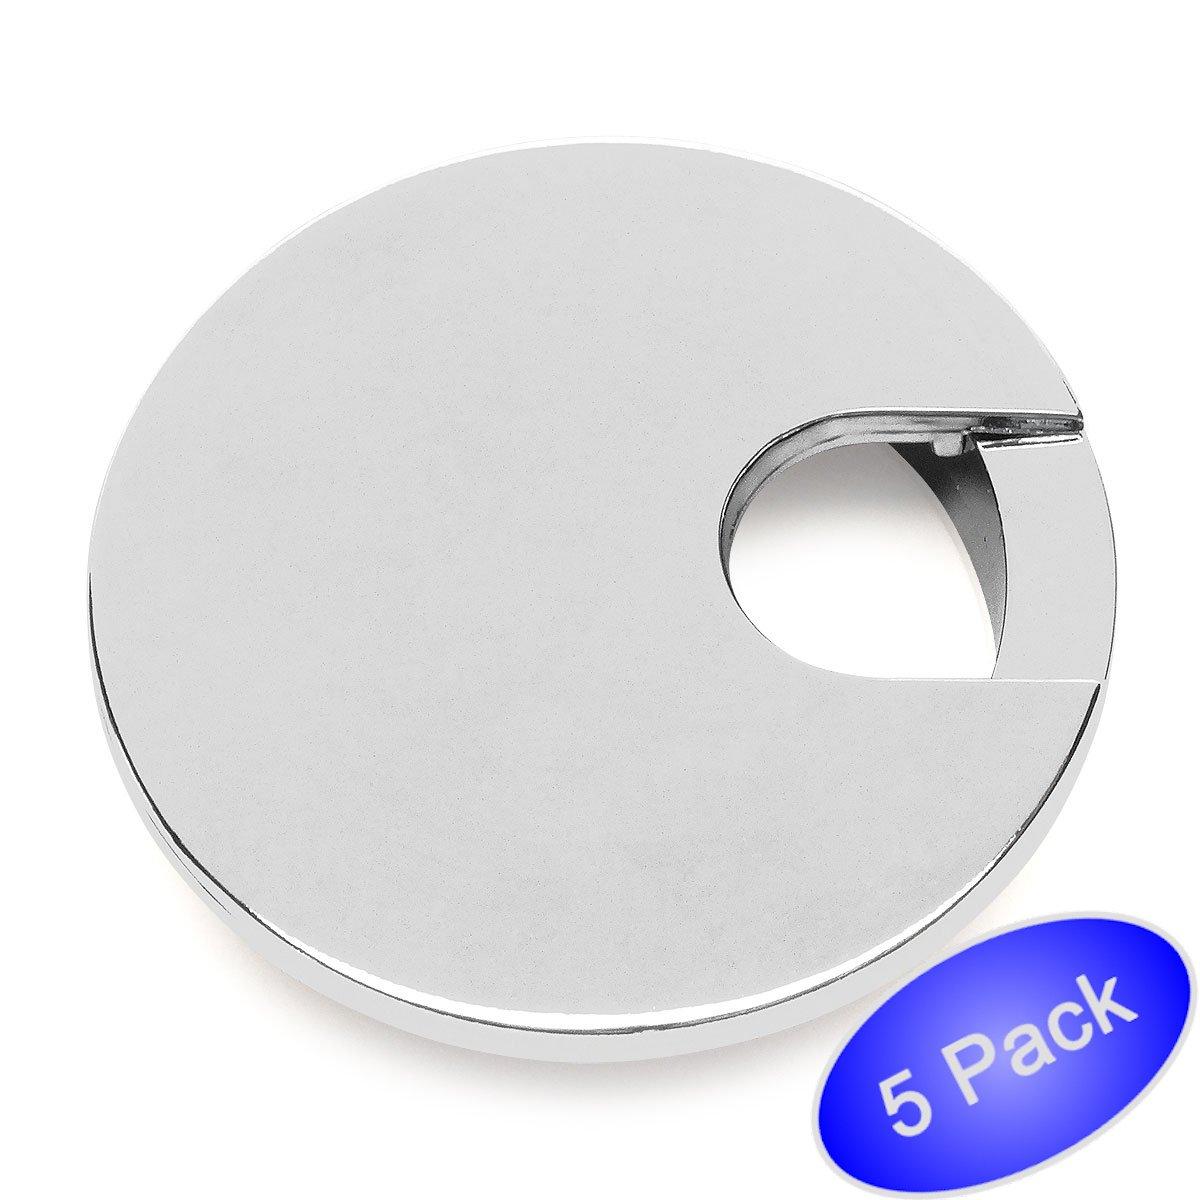 5 Pack - Cosmas 50203CH Polished Chrome 2-1/2'' Two Piece Zinc (Metal) Desk Grommet - 3'' Overall Diameter